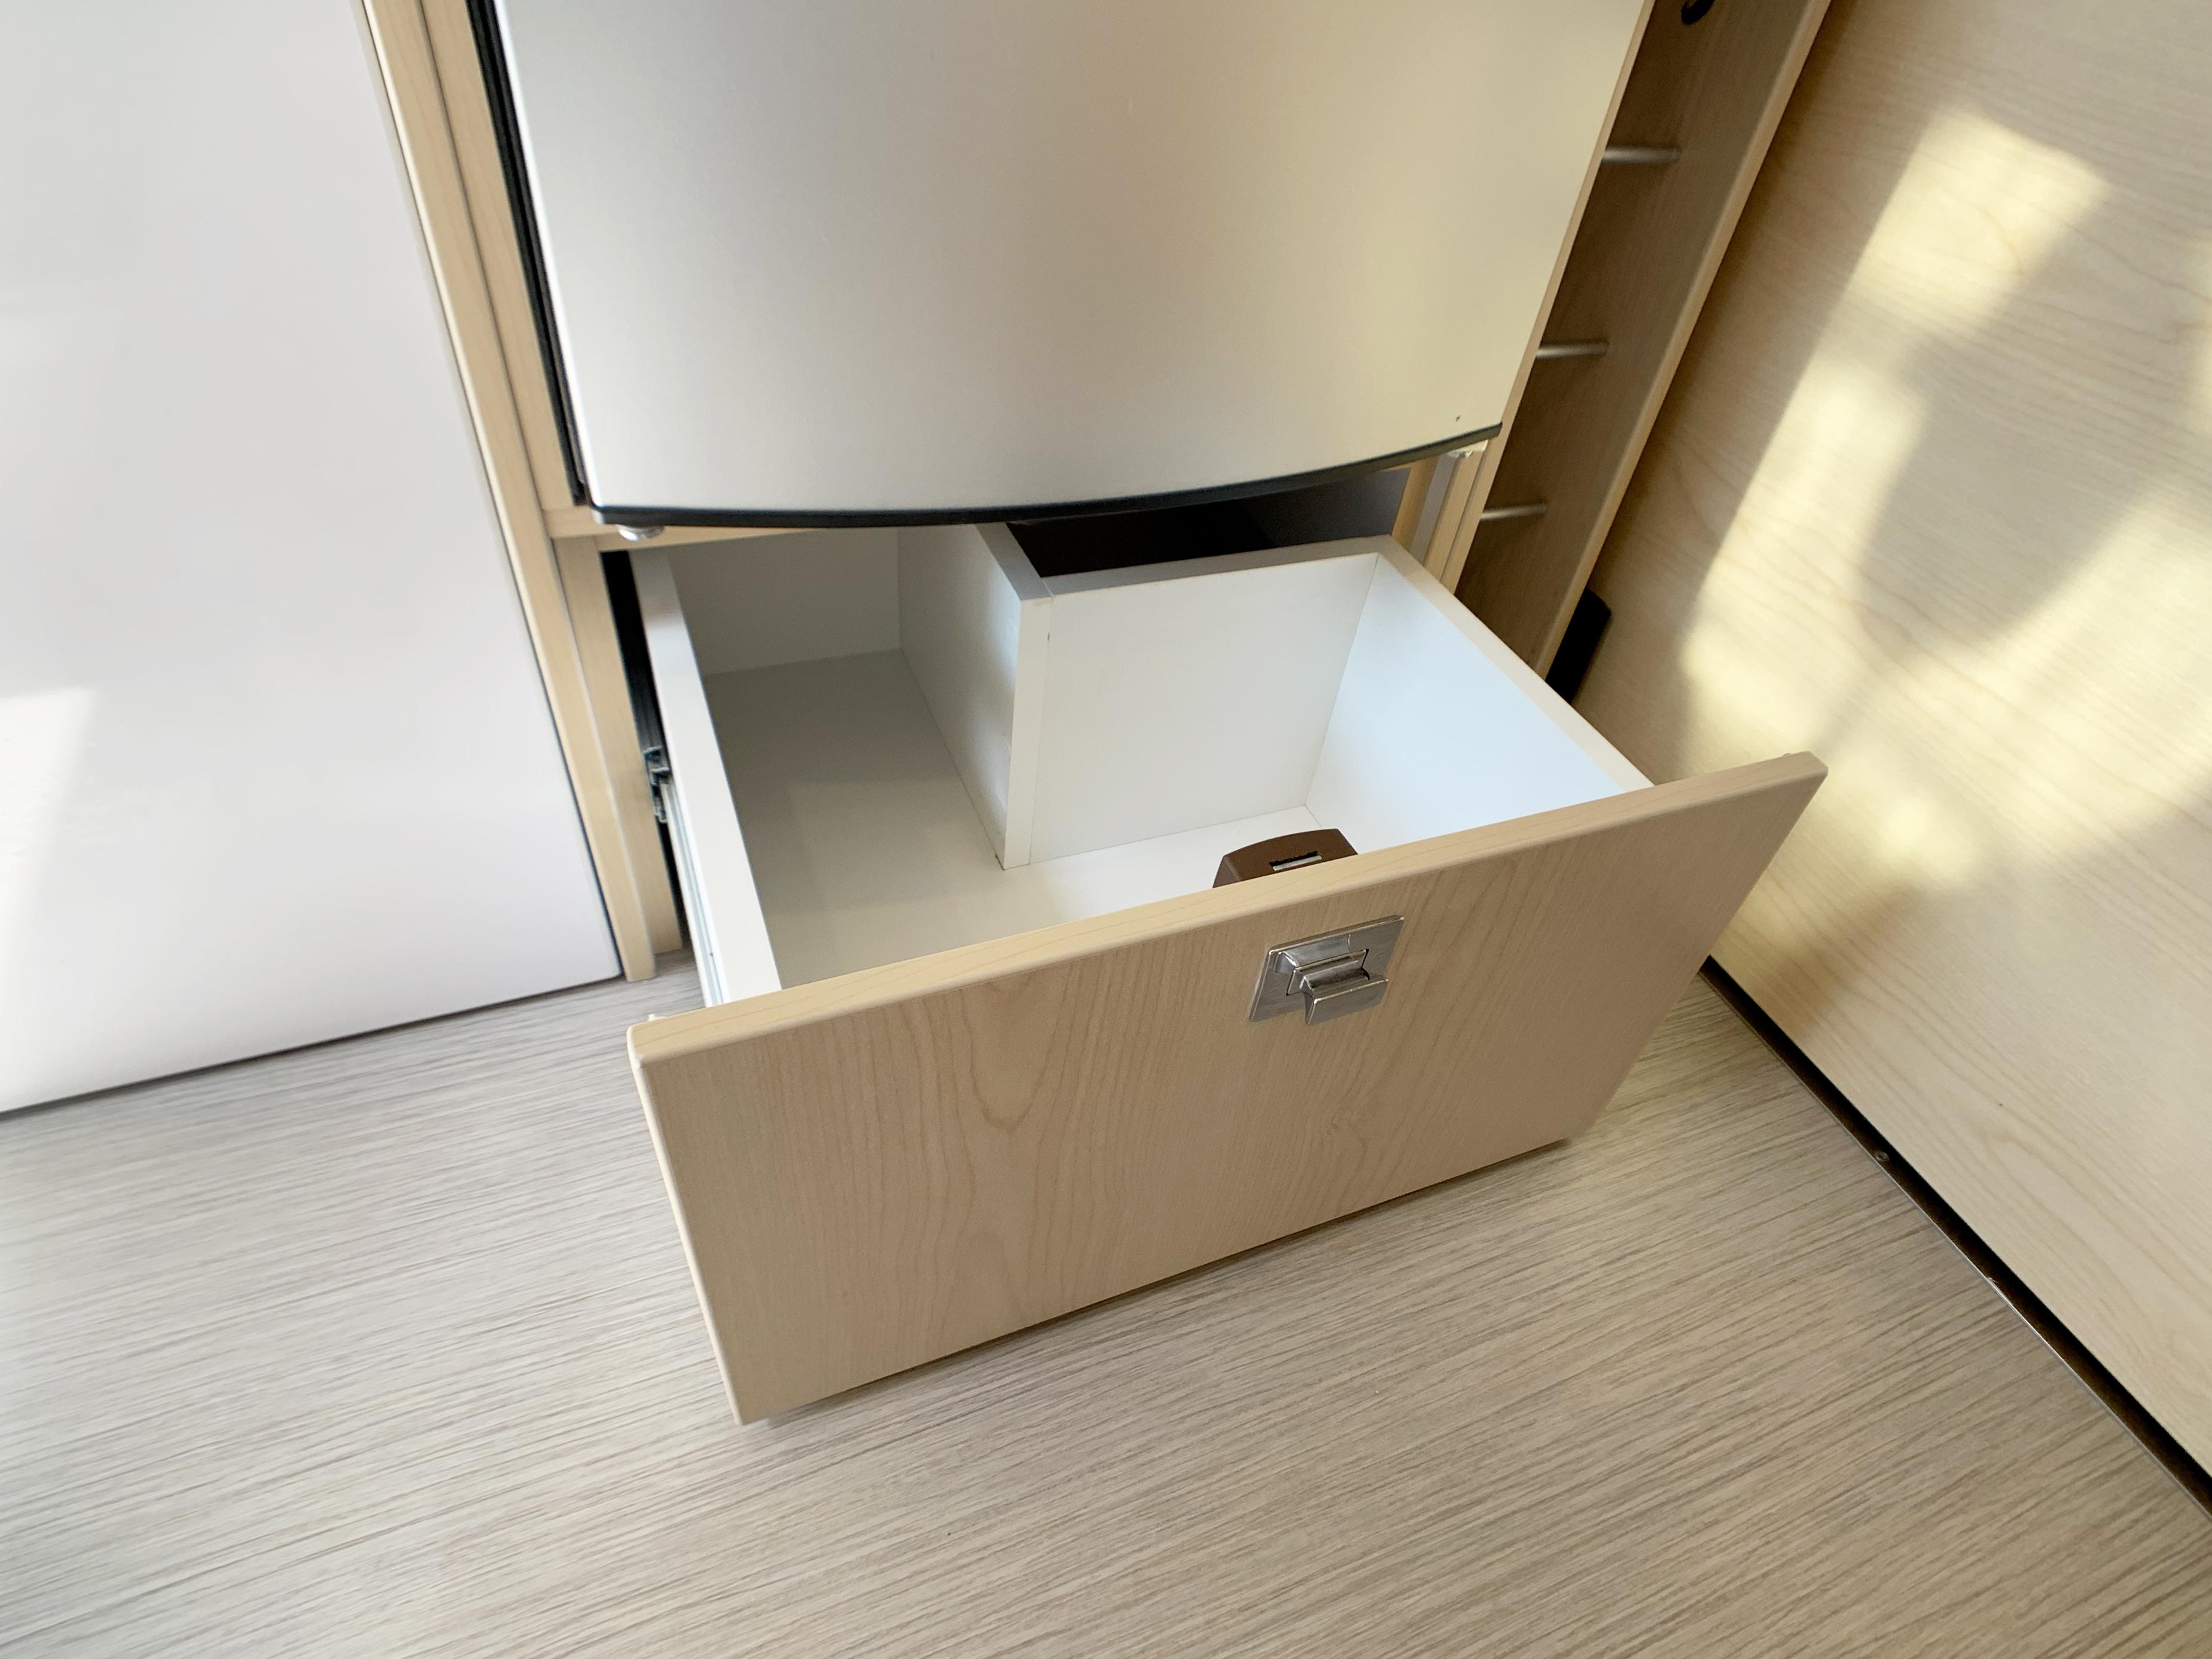 Panoramic RV - Fridge drawer